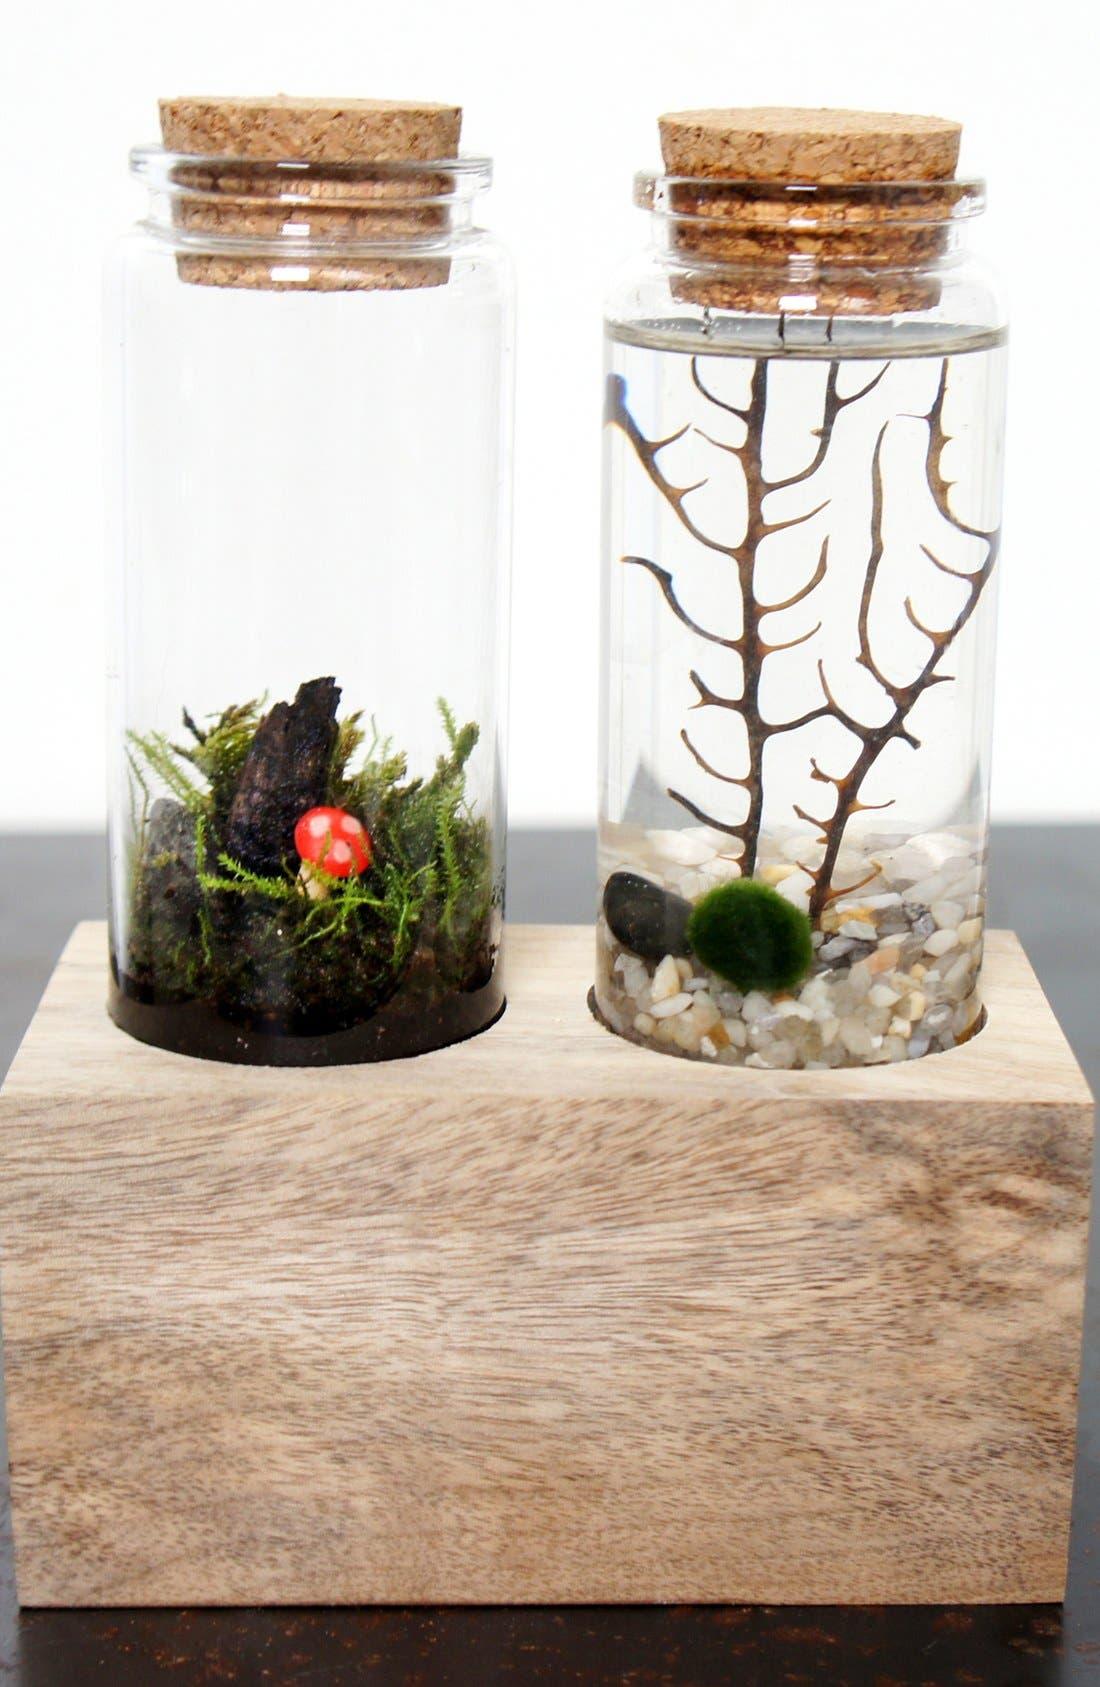 Main Image - Moss + Twigg Land & Sea Terrarium Set